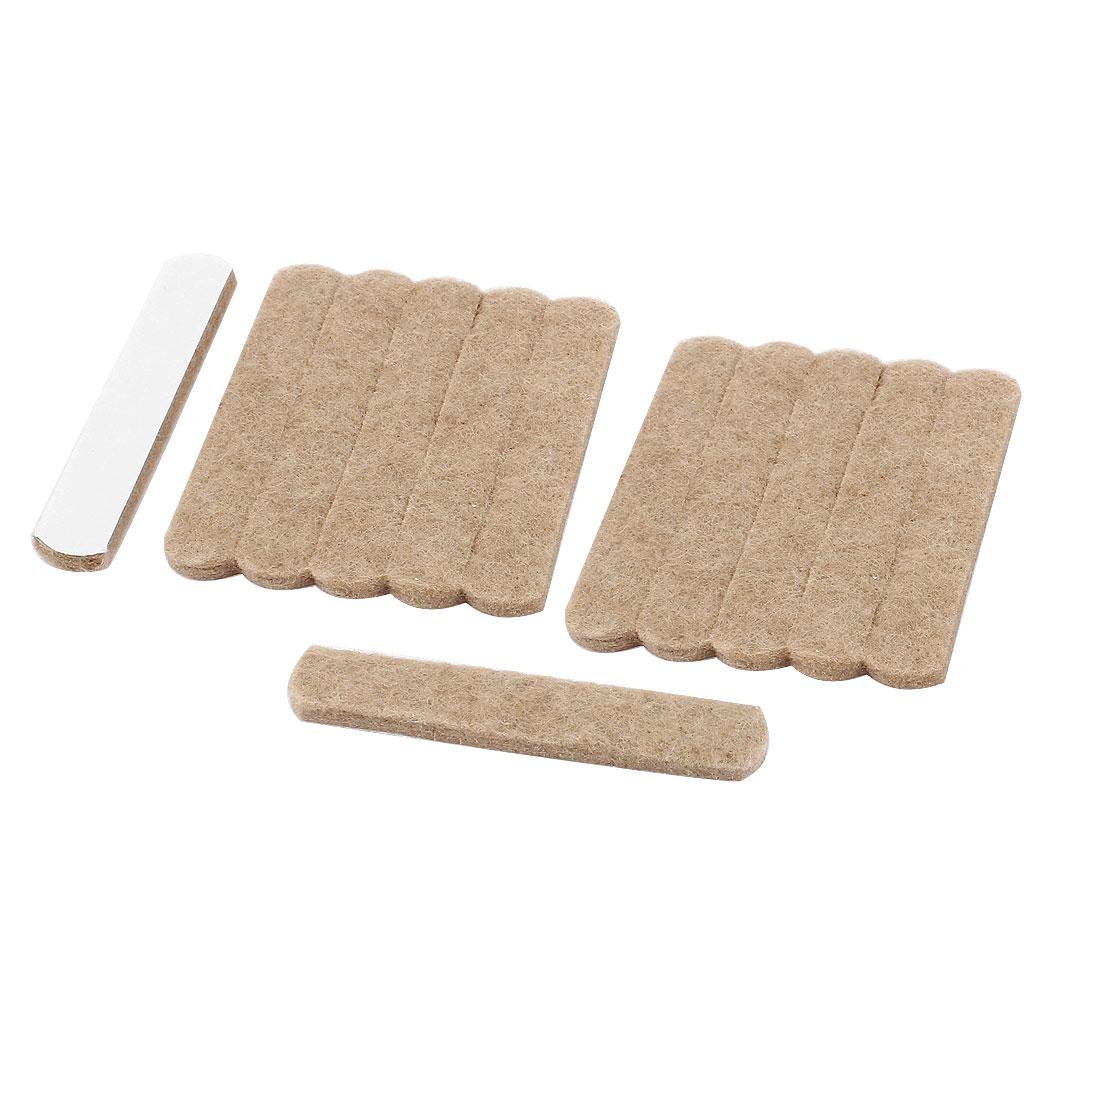 Cabinet Chair Floor Felt Corner Pads Bumper Protector Khaki 12pcs